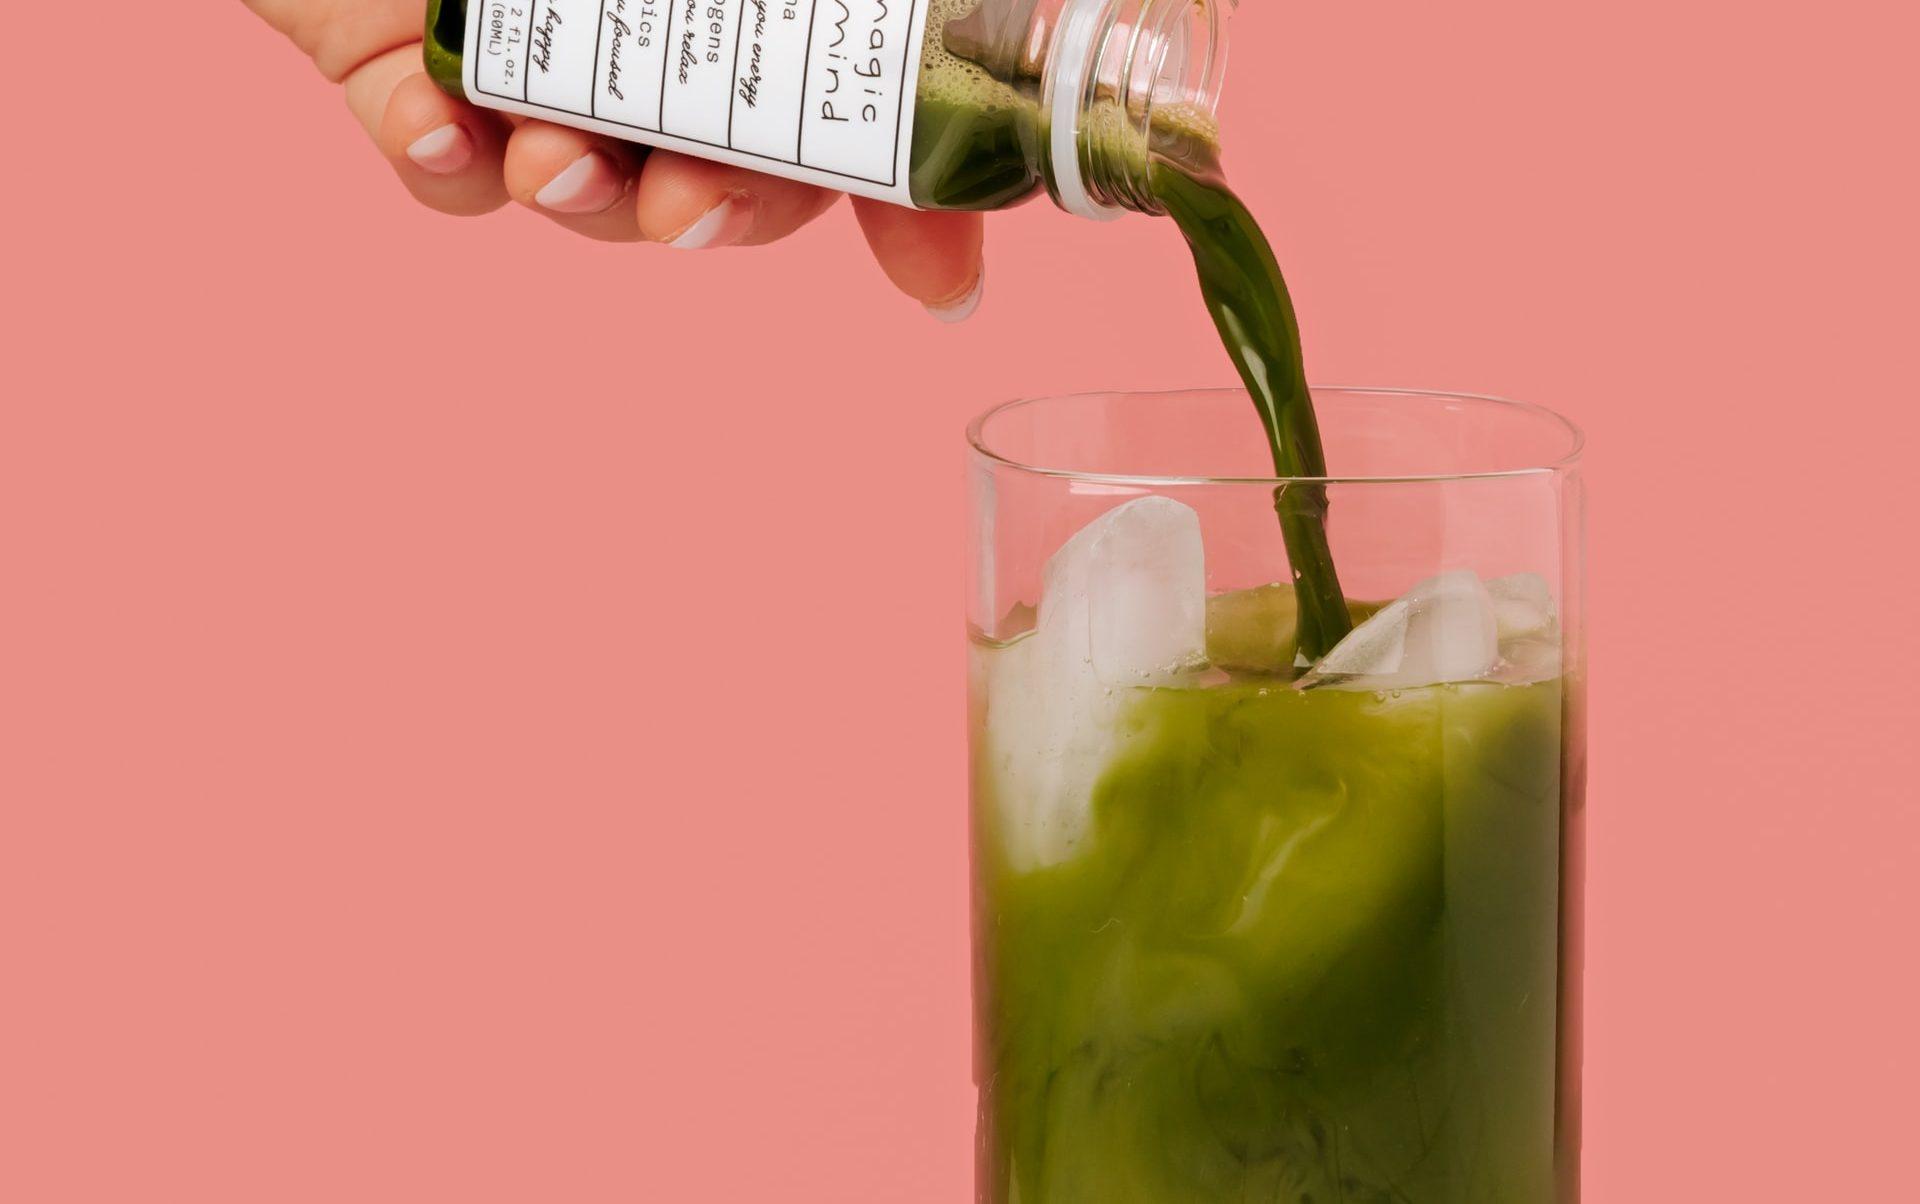 bebida verde